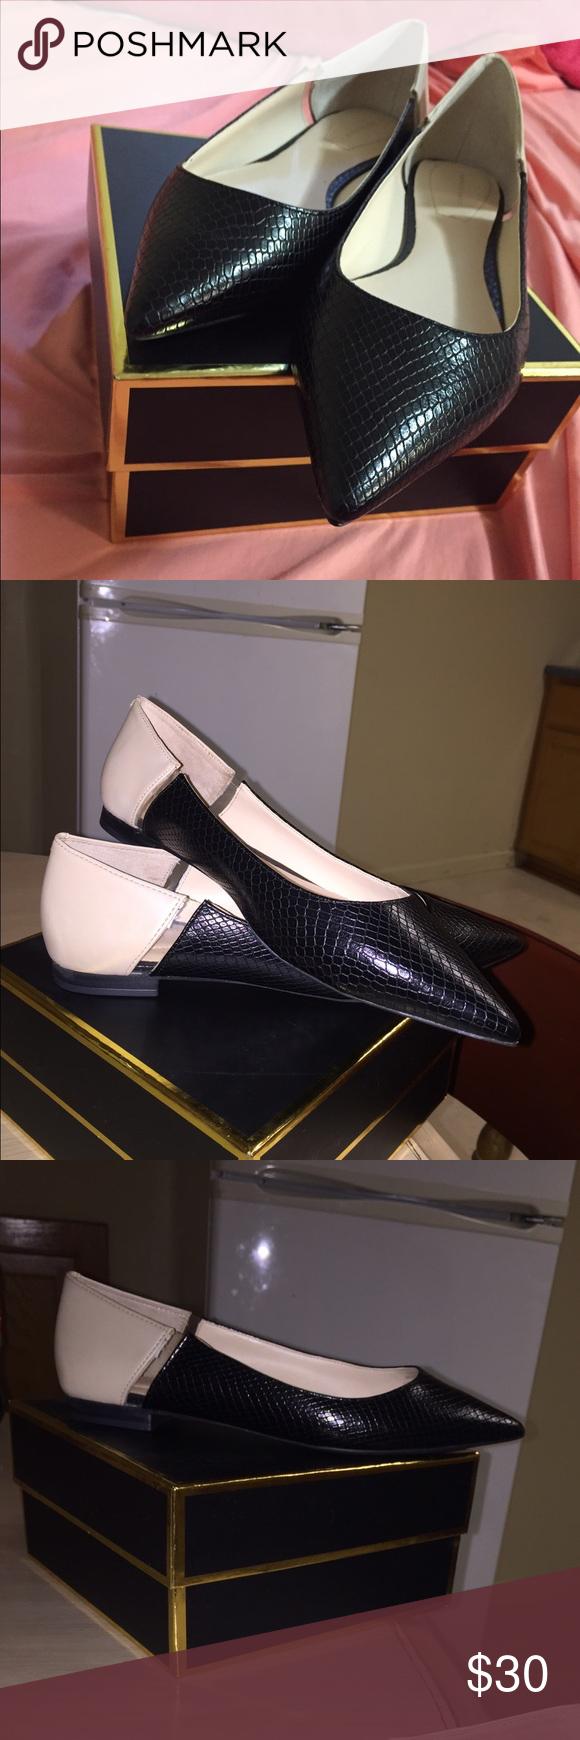 Brand new Zara flats Brand new flats! Perfect shape Zara Shoes Flats & Loafers